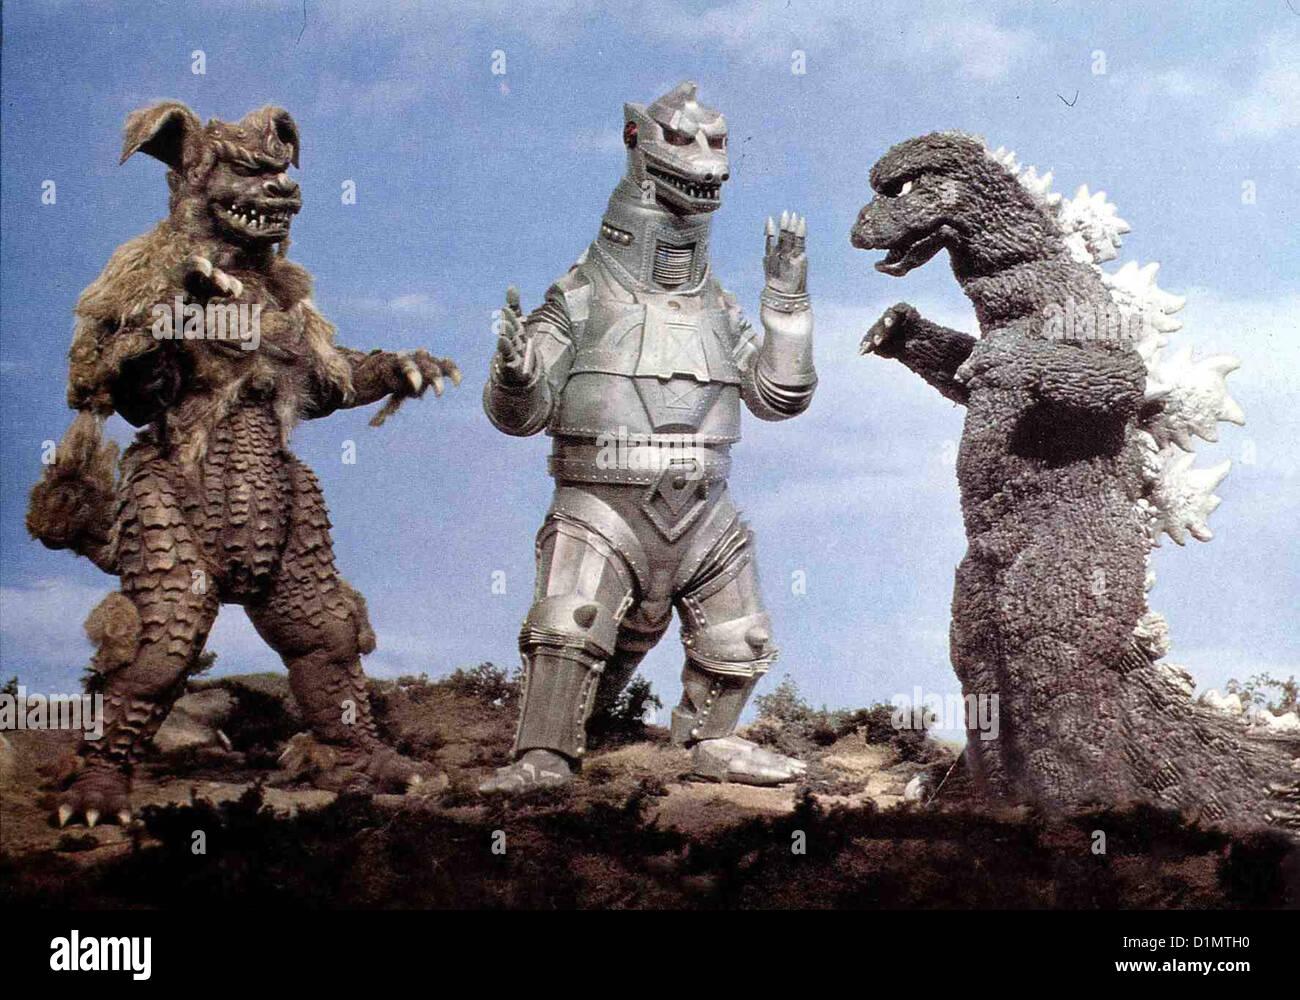 King Kong Gegen Godzilla   Gojira Tai Mekagojira   Szene *** Local Caption *** 1973  -- - Stock Image